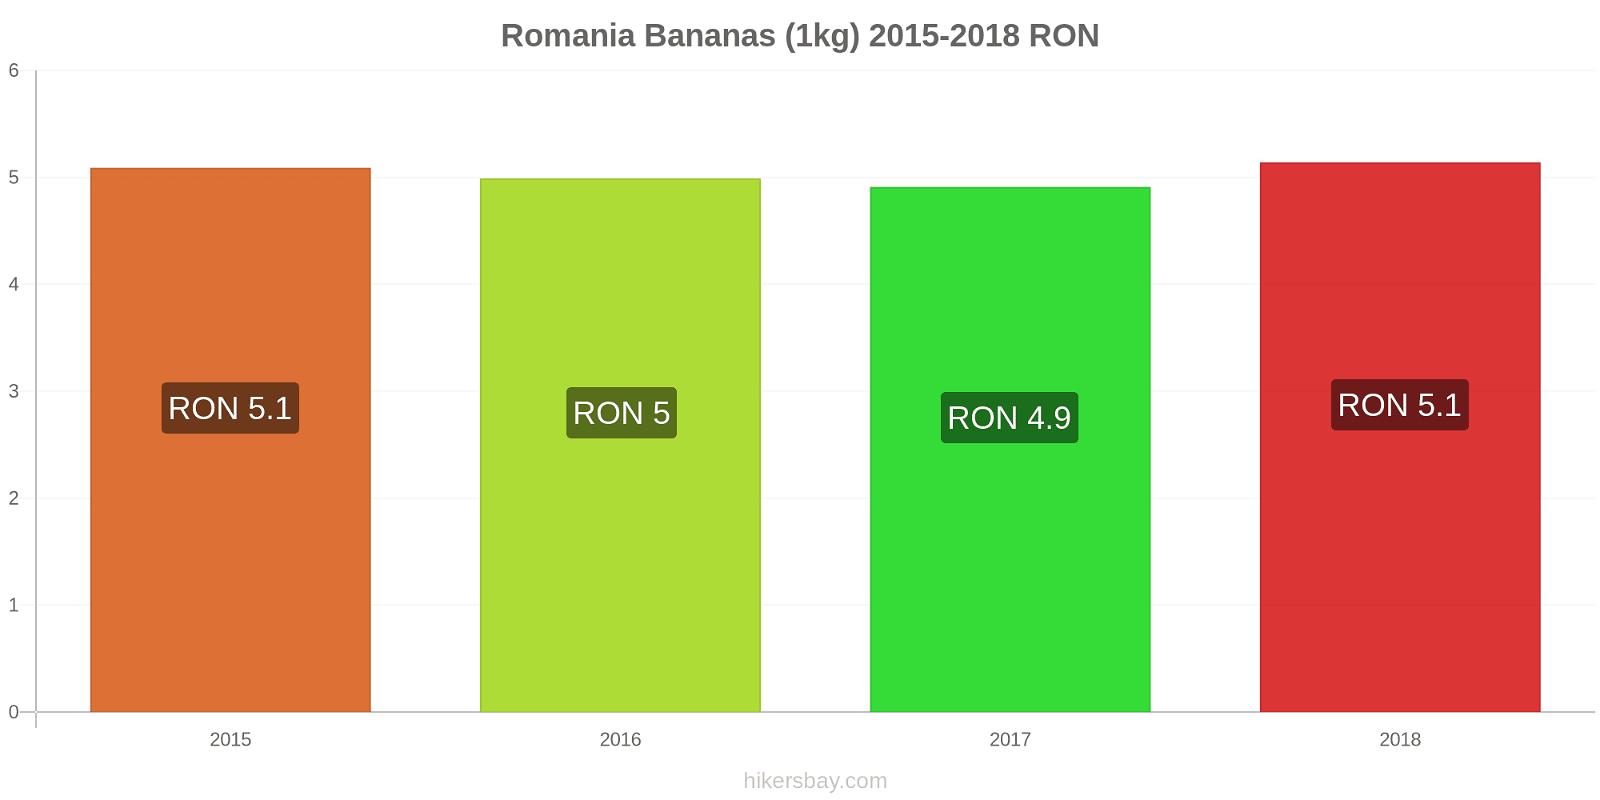 Romania price changes Bananas (1kg) hikersbay.com